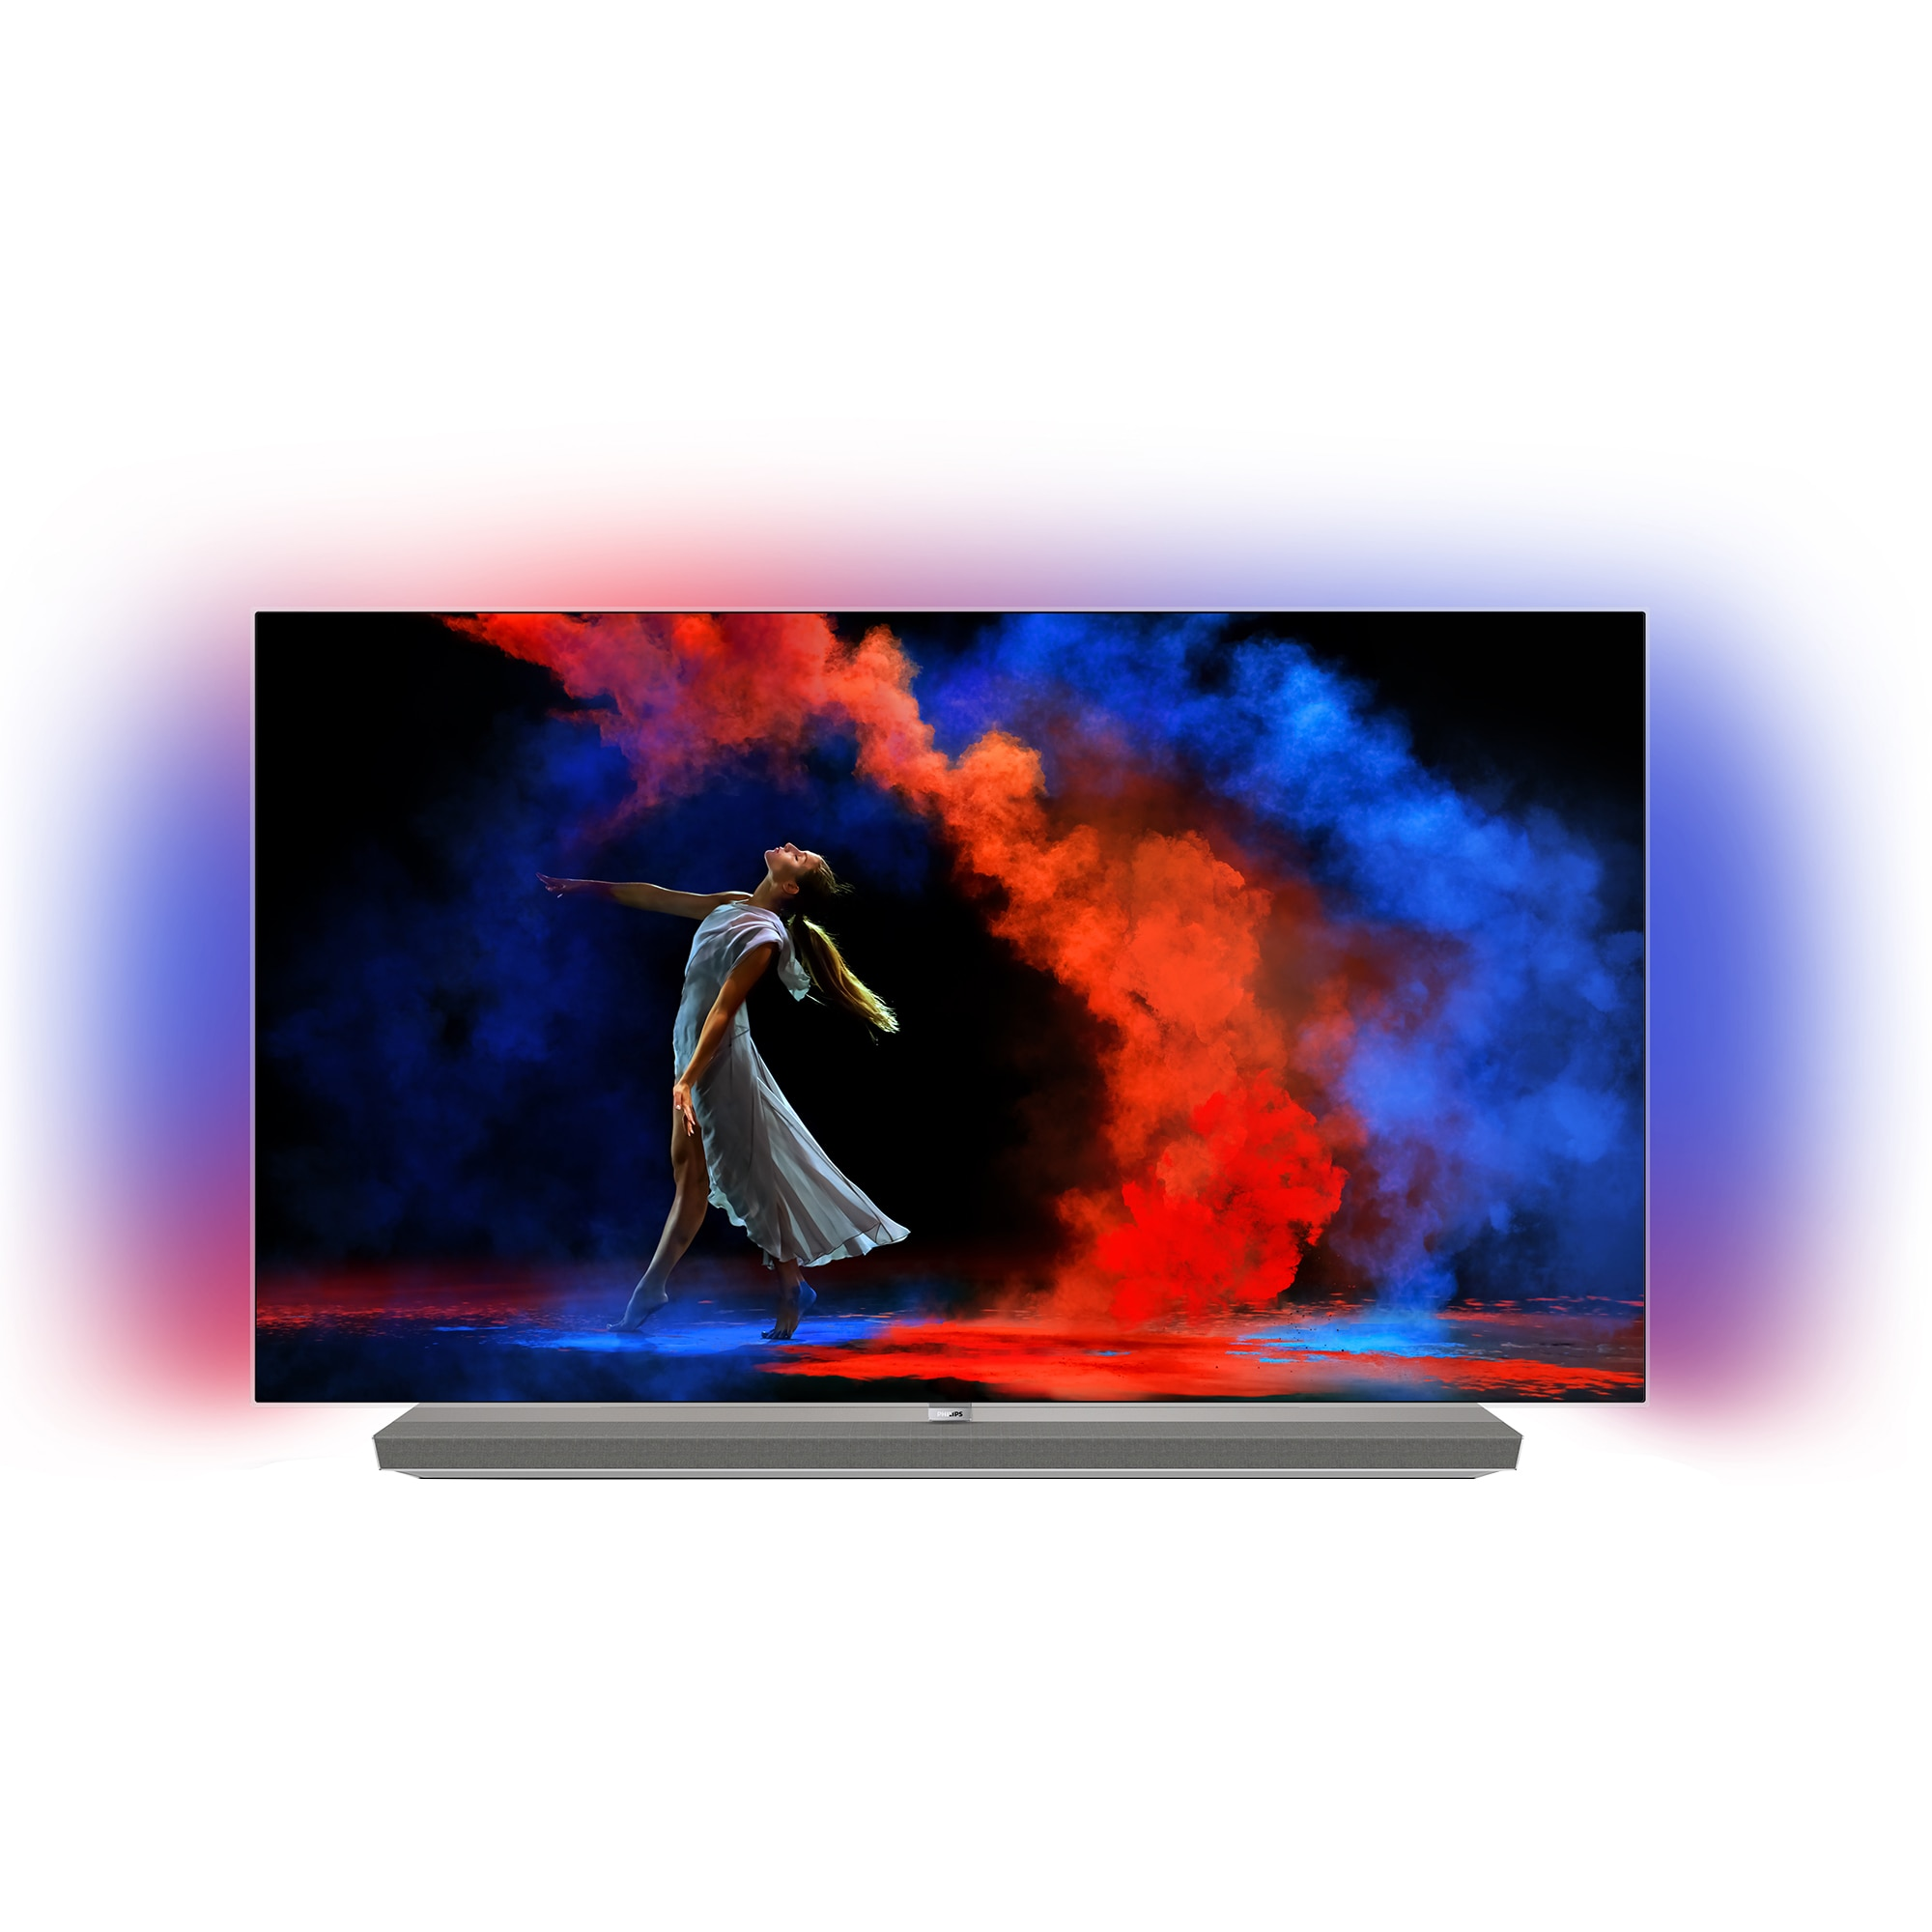 Fotografie Televizor OLED Smart Android Philips, 164 cm, 65OLED973/12, 4K Ultra HD, Clasa B